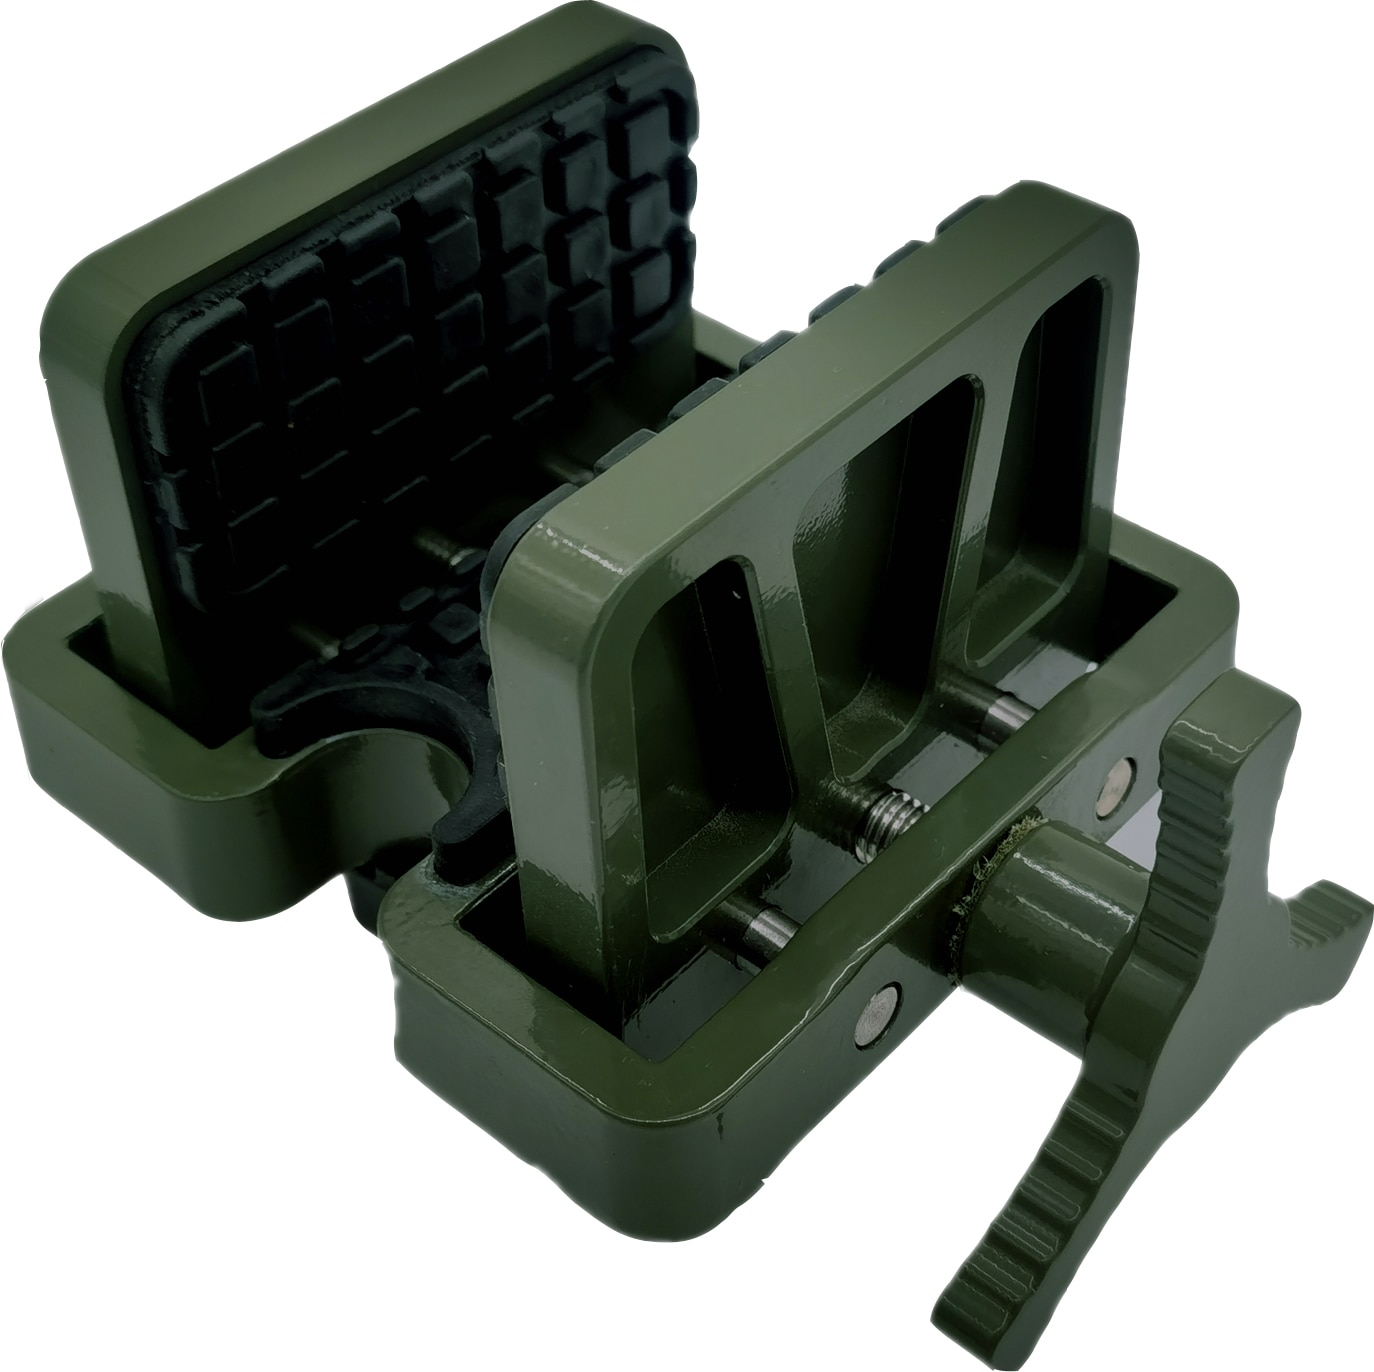 BOG DeathGrip بندقية محول تثبيت الترايبود البناء خفيفة الوزن ومشبك عالمي للصيد